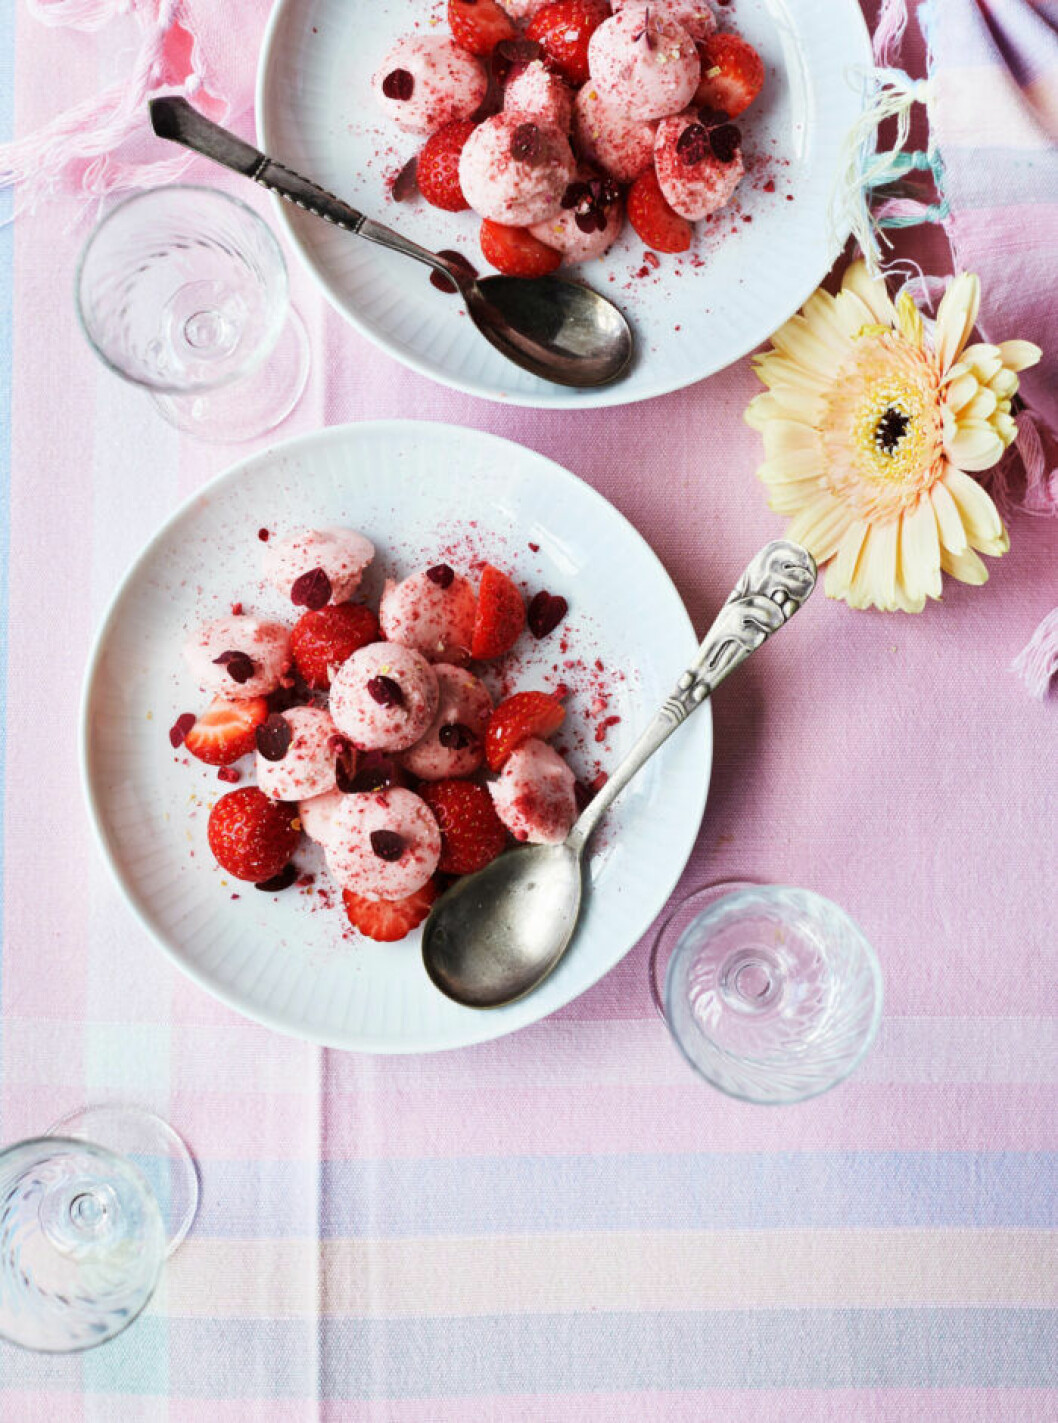 Recept på jordgubbsmousse med vit choklad